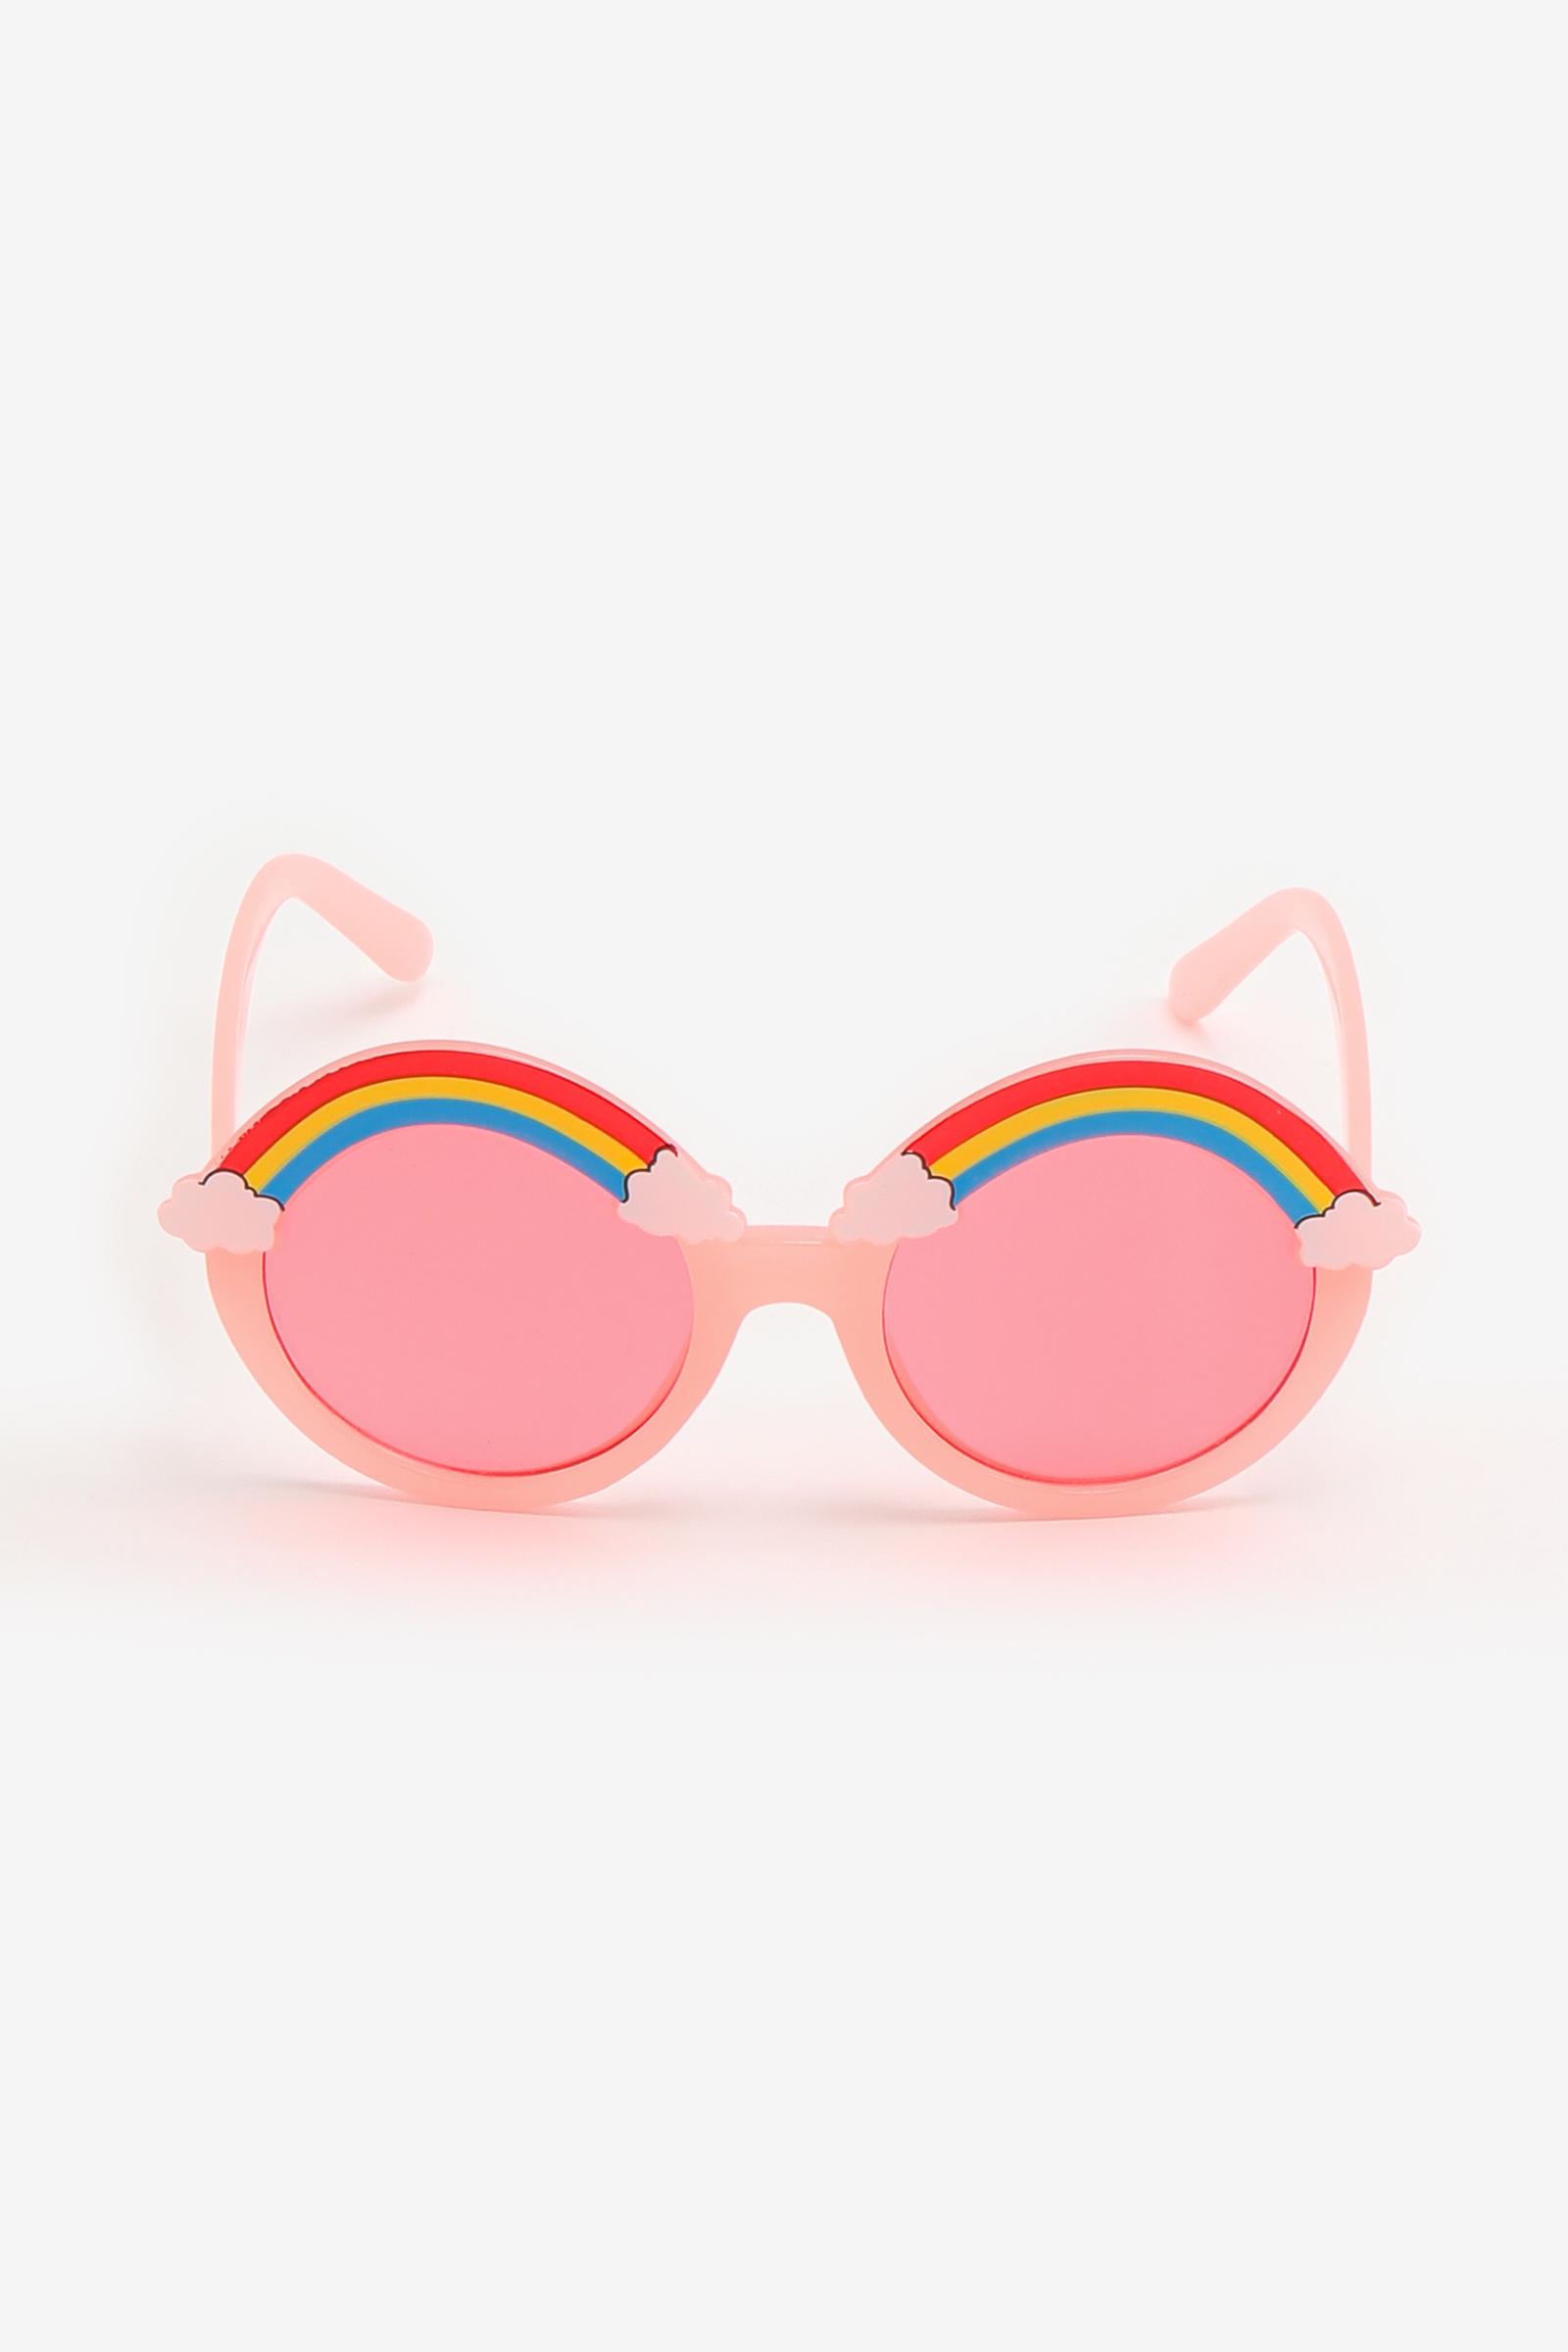 Rainbow Sunglasses for Kids